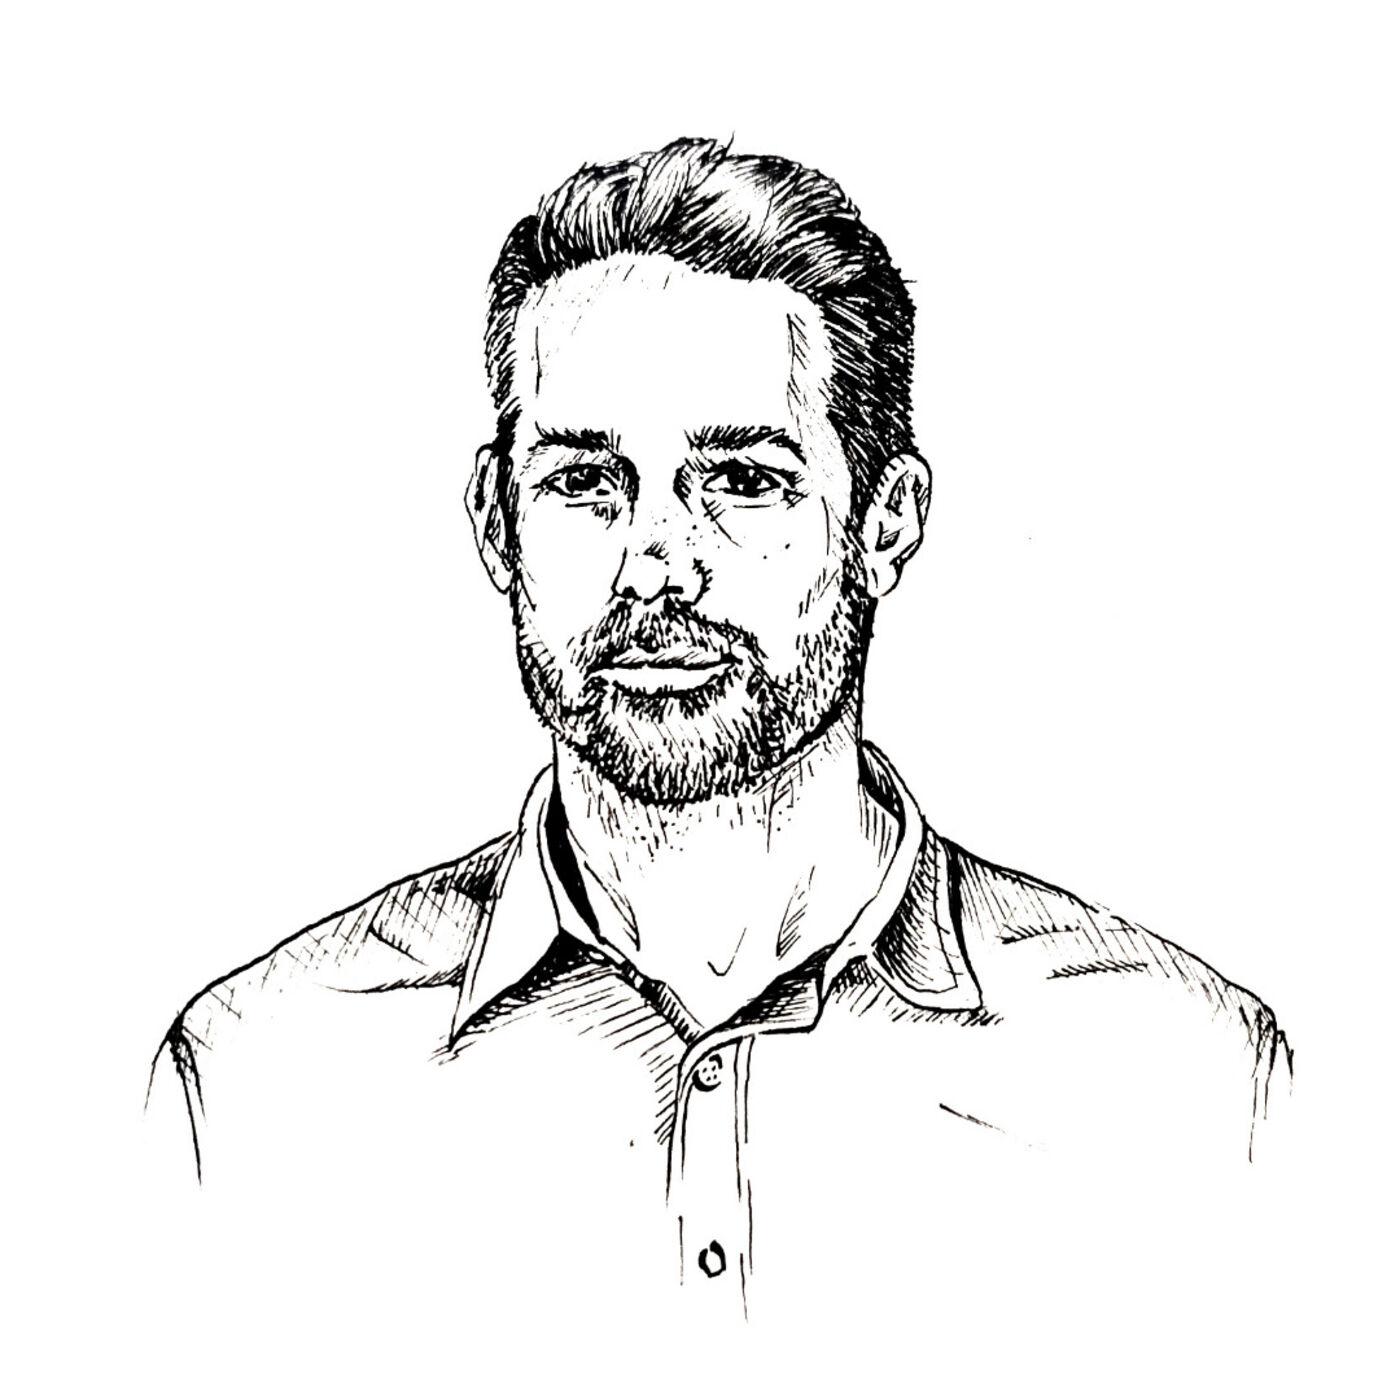 Episode 3: Gabe Cooper & the joy of fundraising